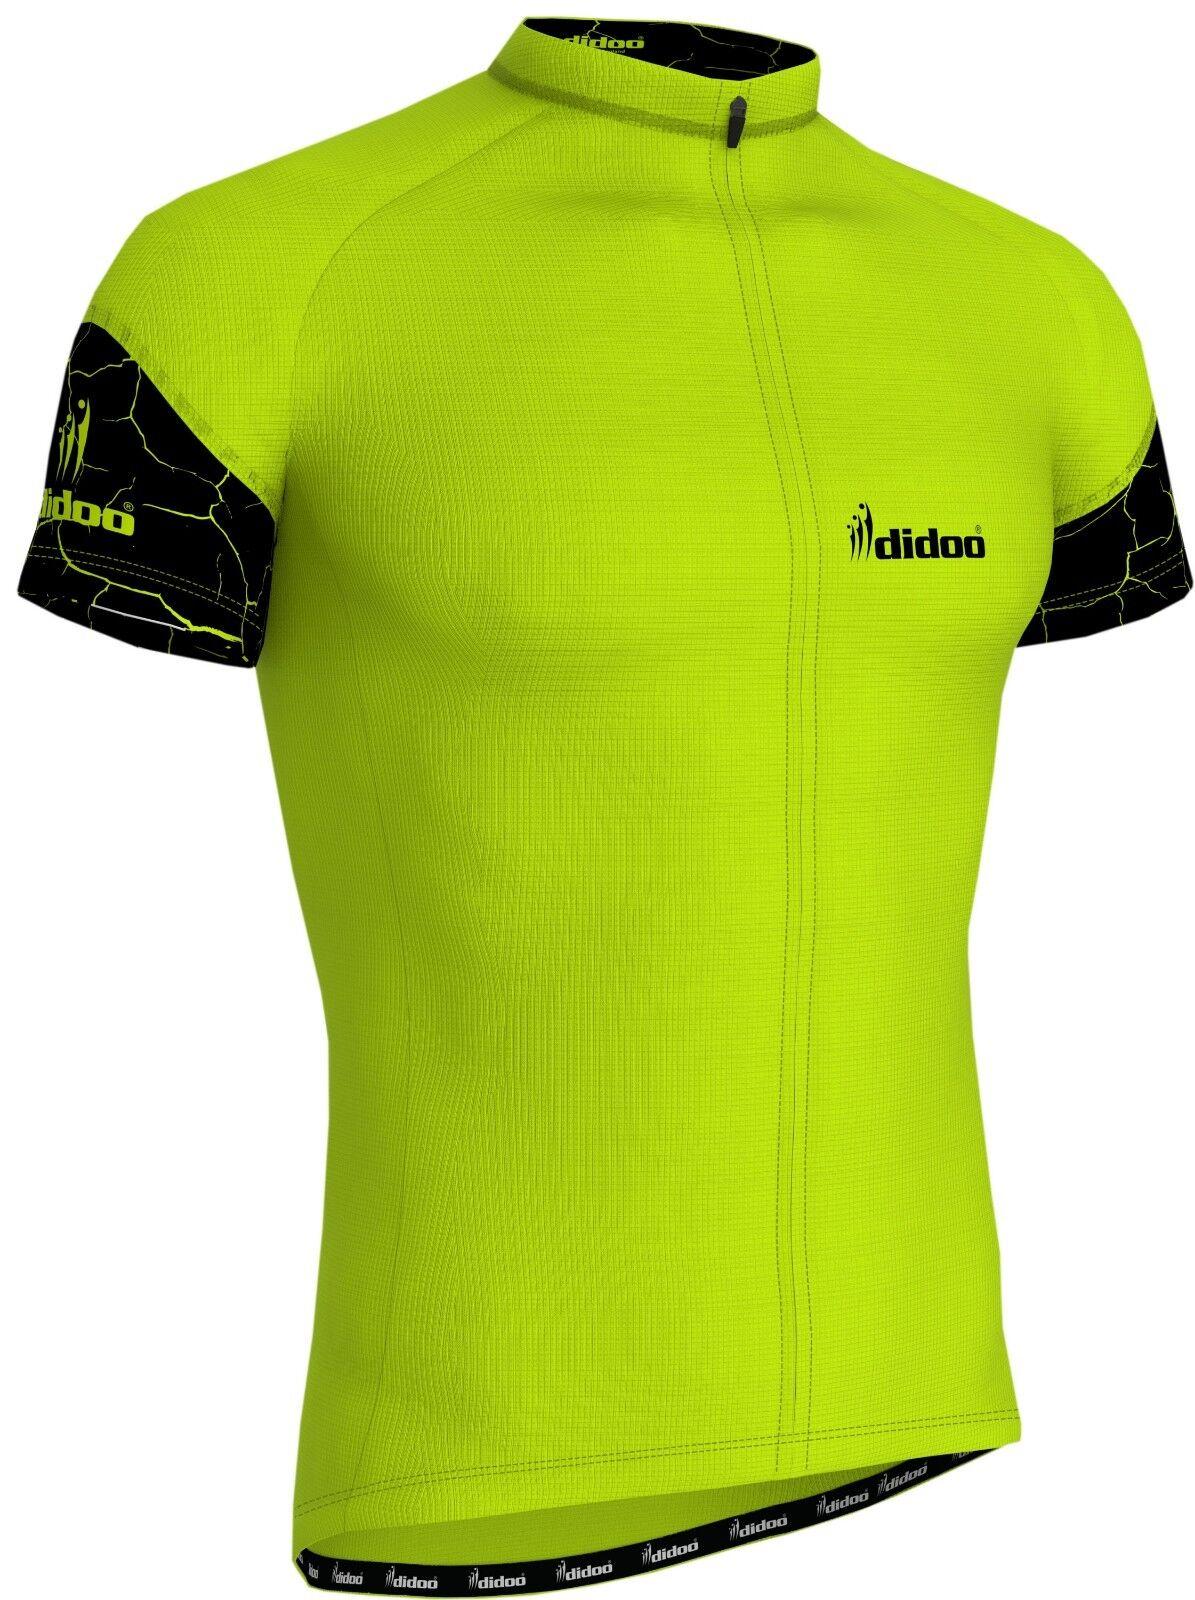 f5db104c9 New Men s Half Sleeve Cycling Jerseys Riding T-Shirts Sports Road ...